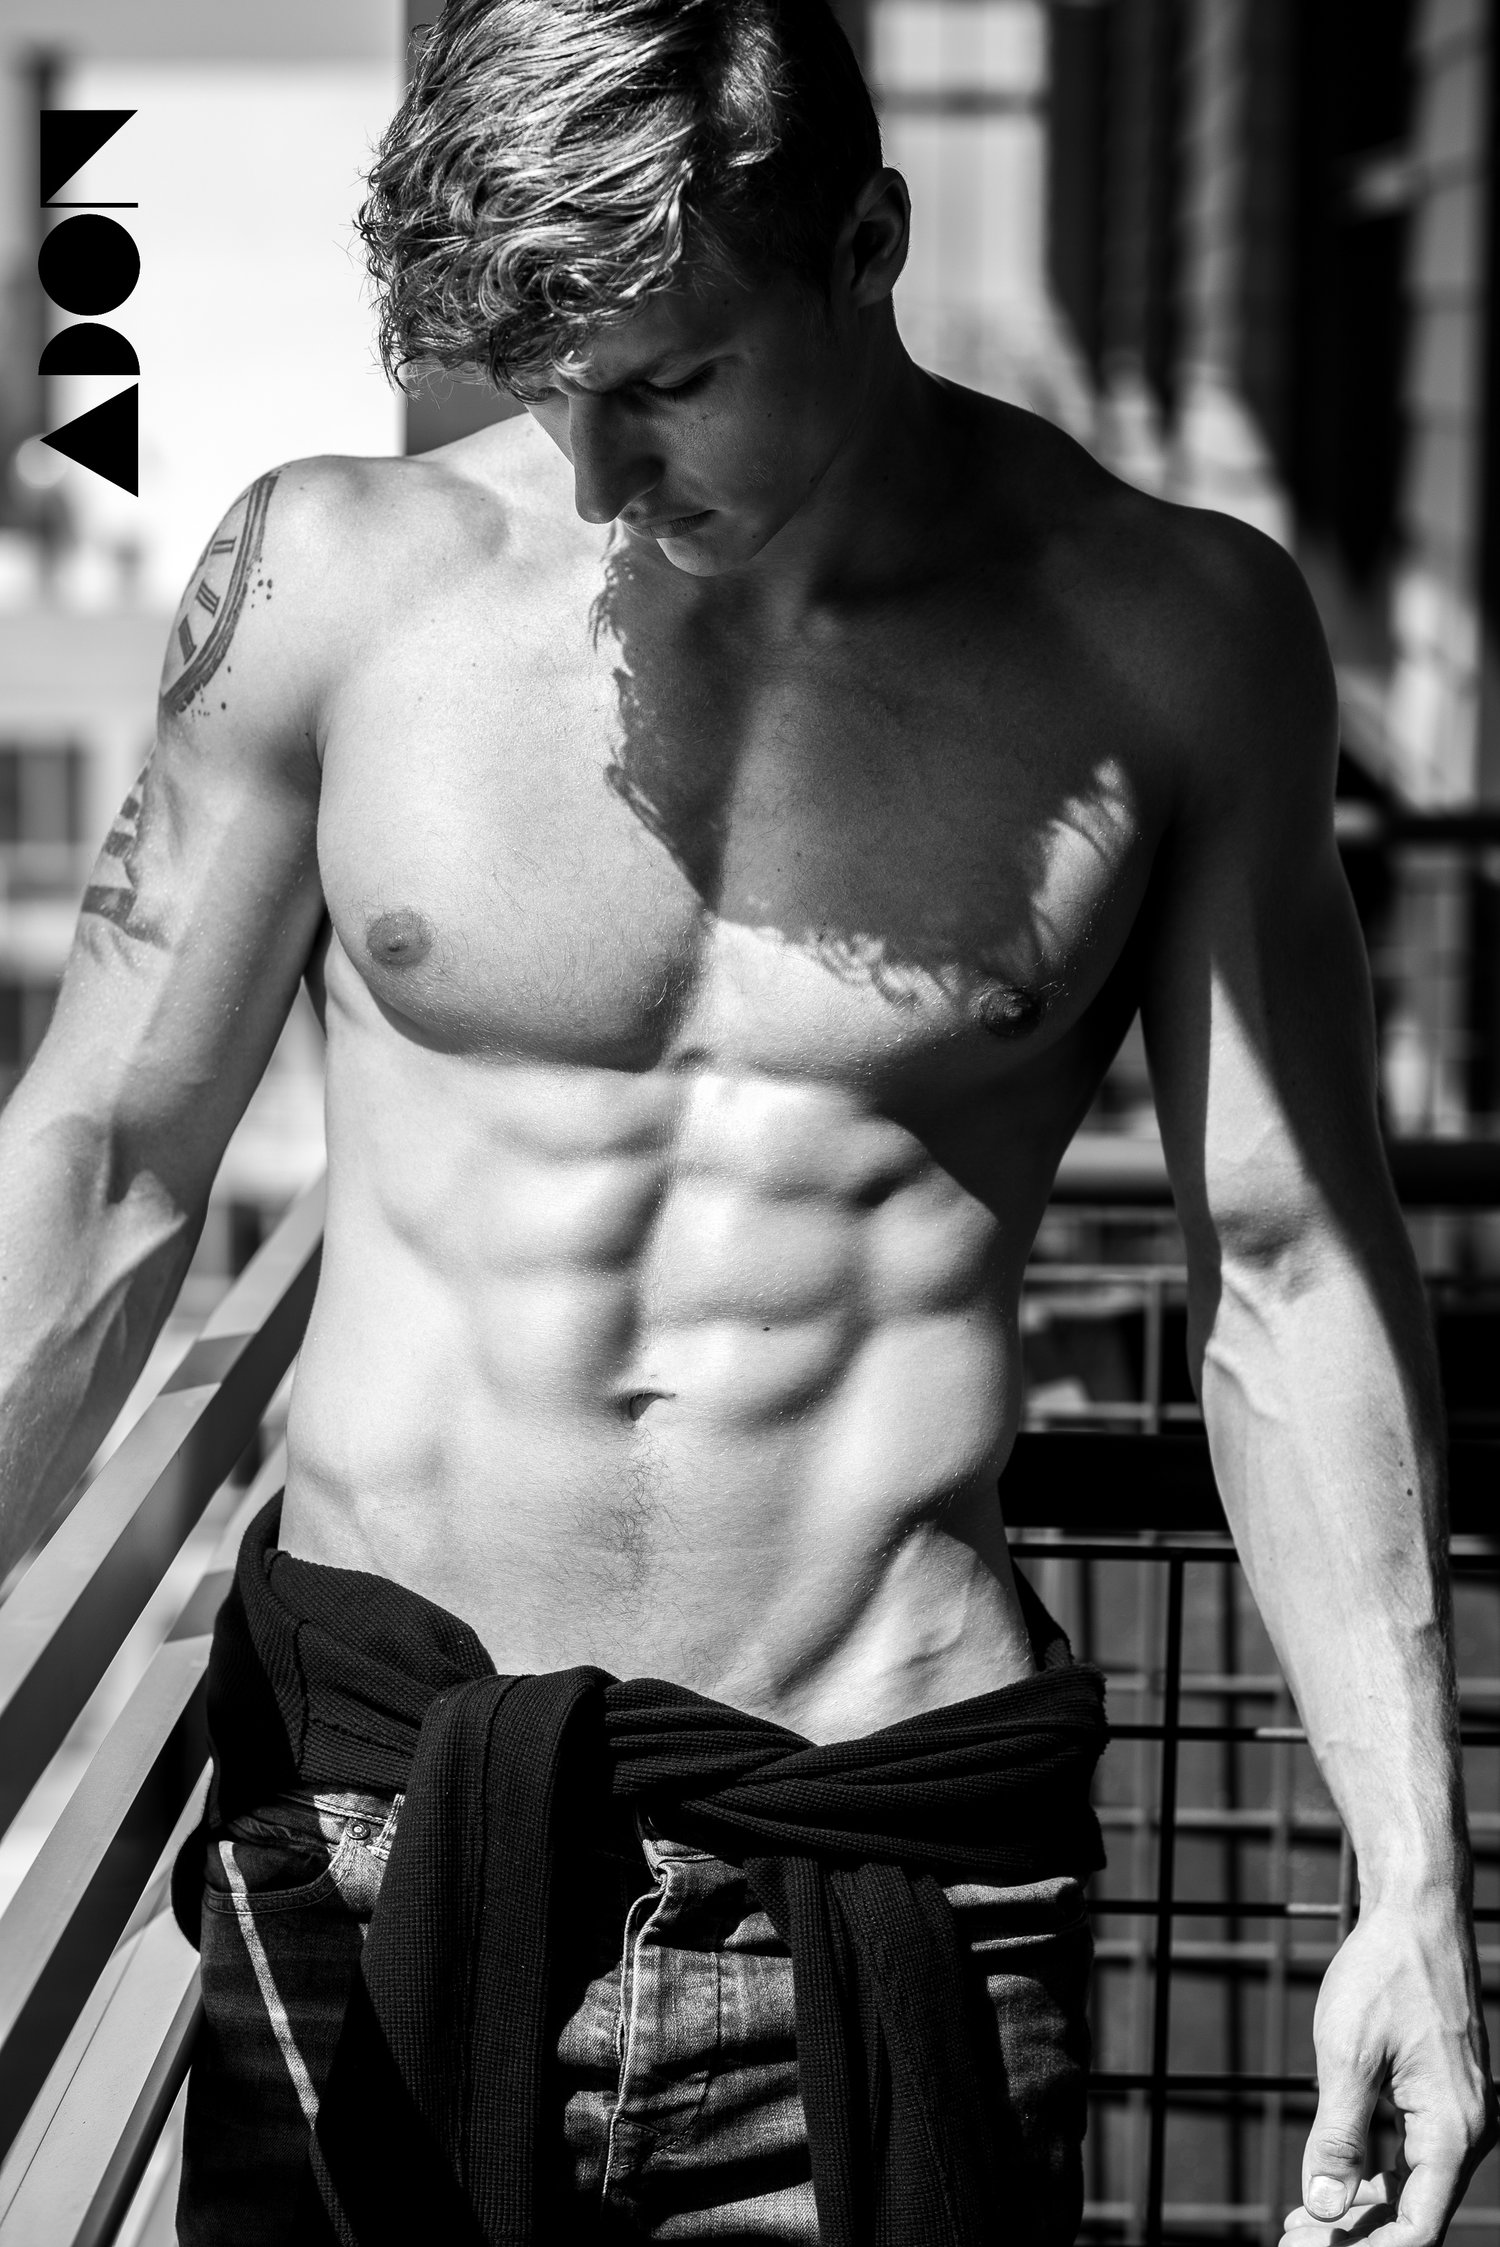 Adon Exclusive: Model Nikita Konovalov By Jonjie Baniel